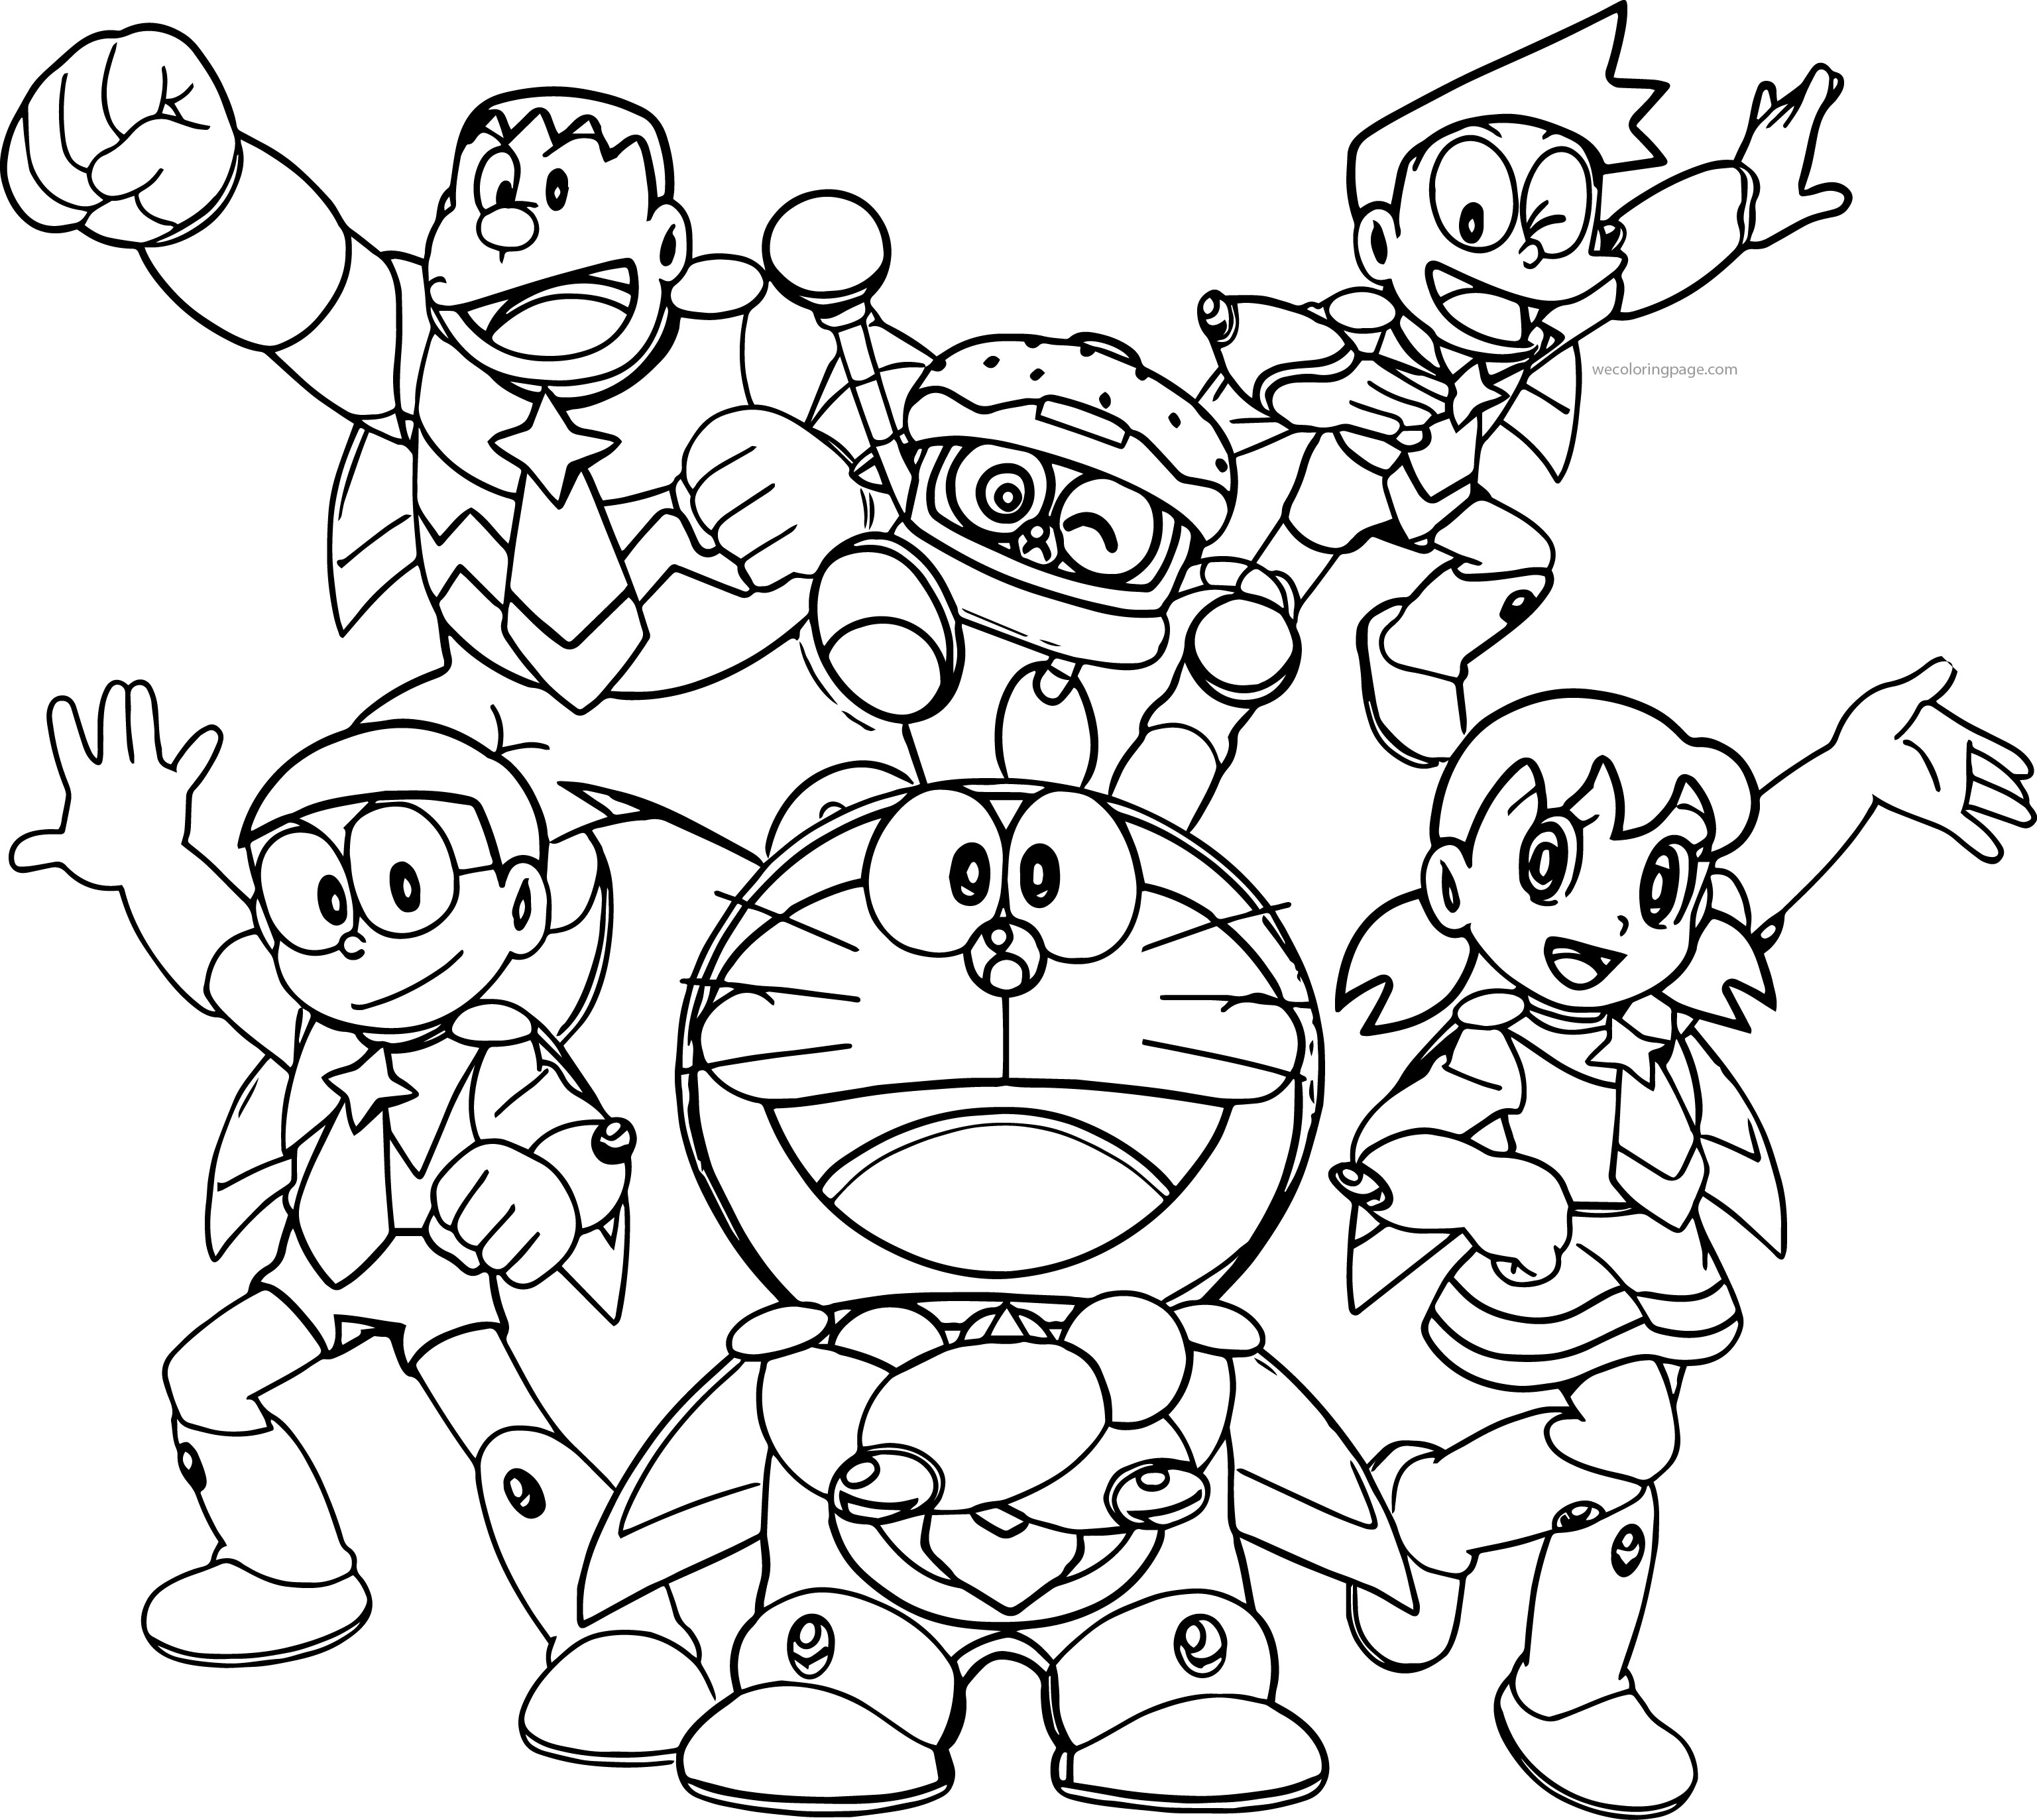 Doraemon Team Time Coloring Page